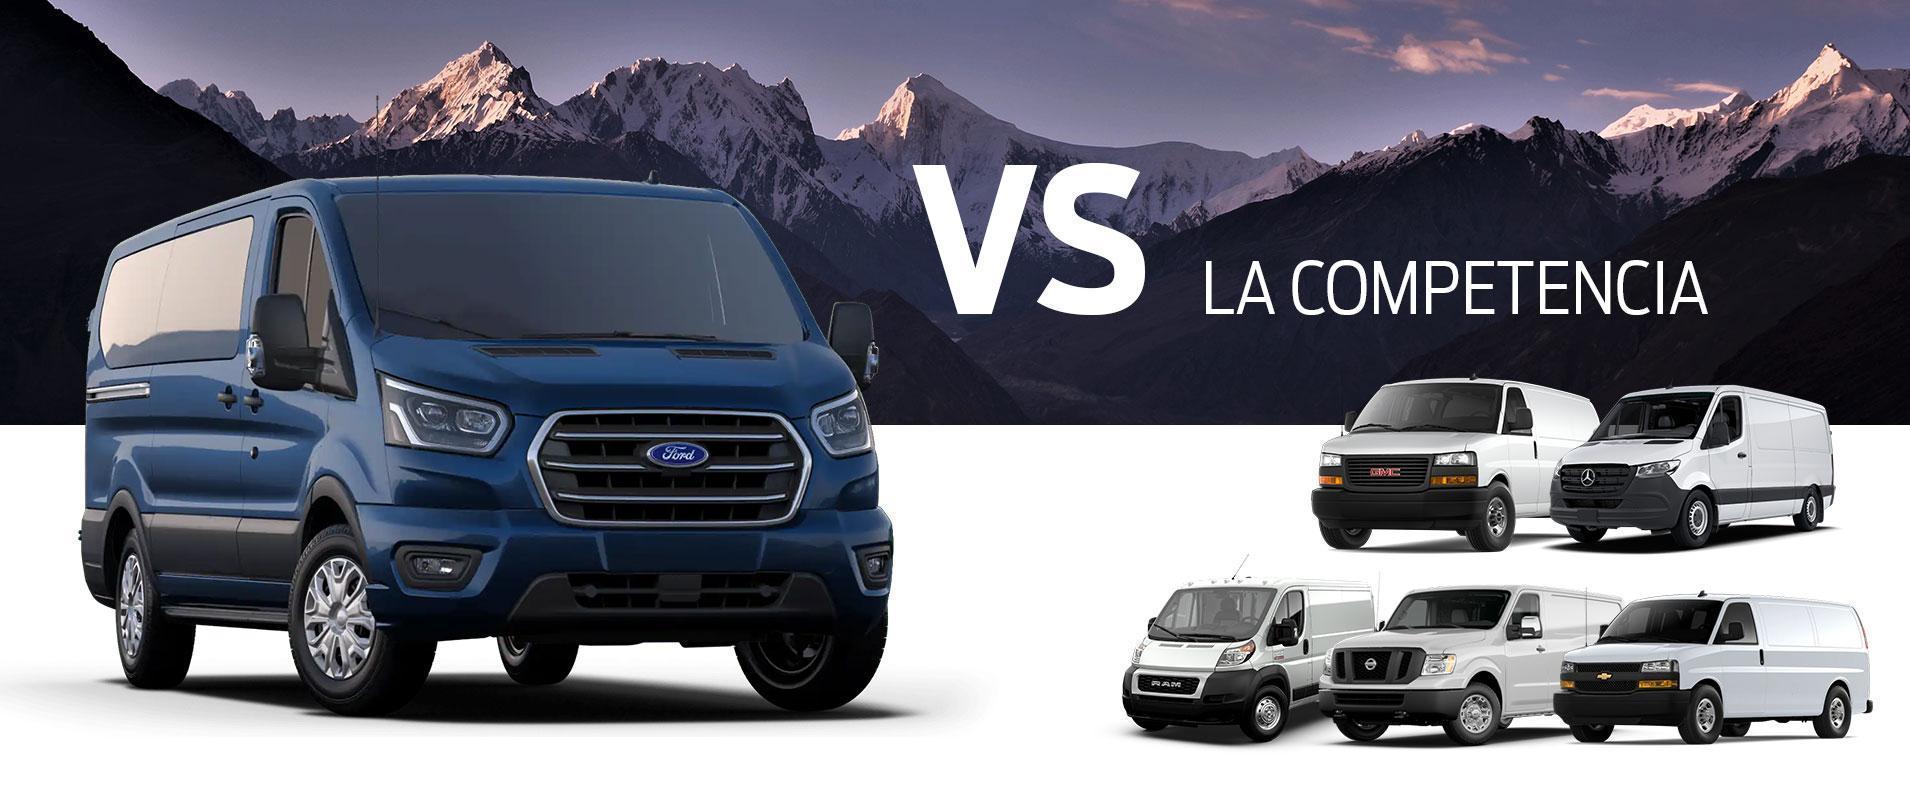 Transit vs Competition